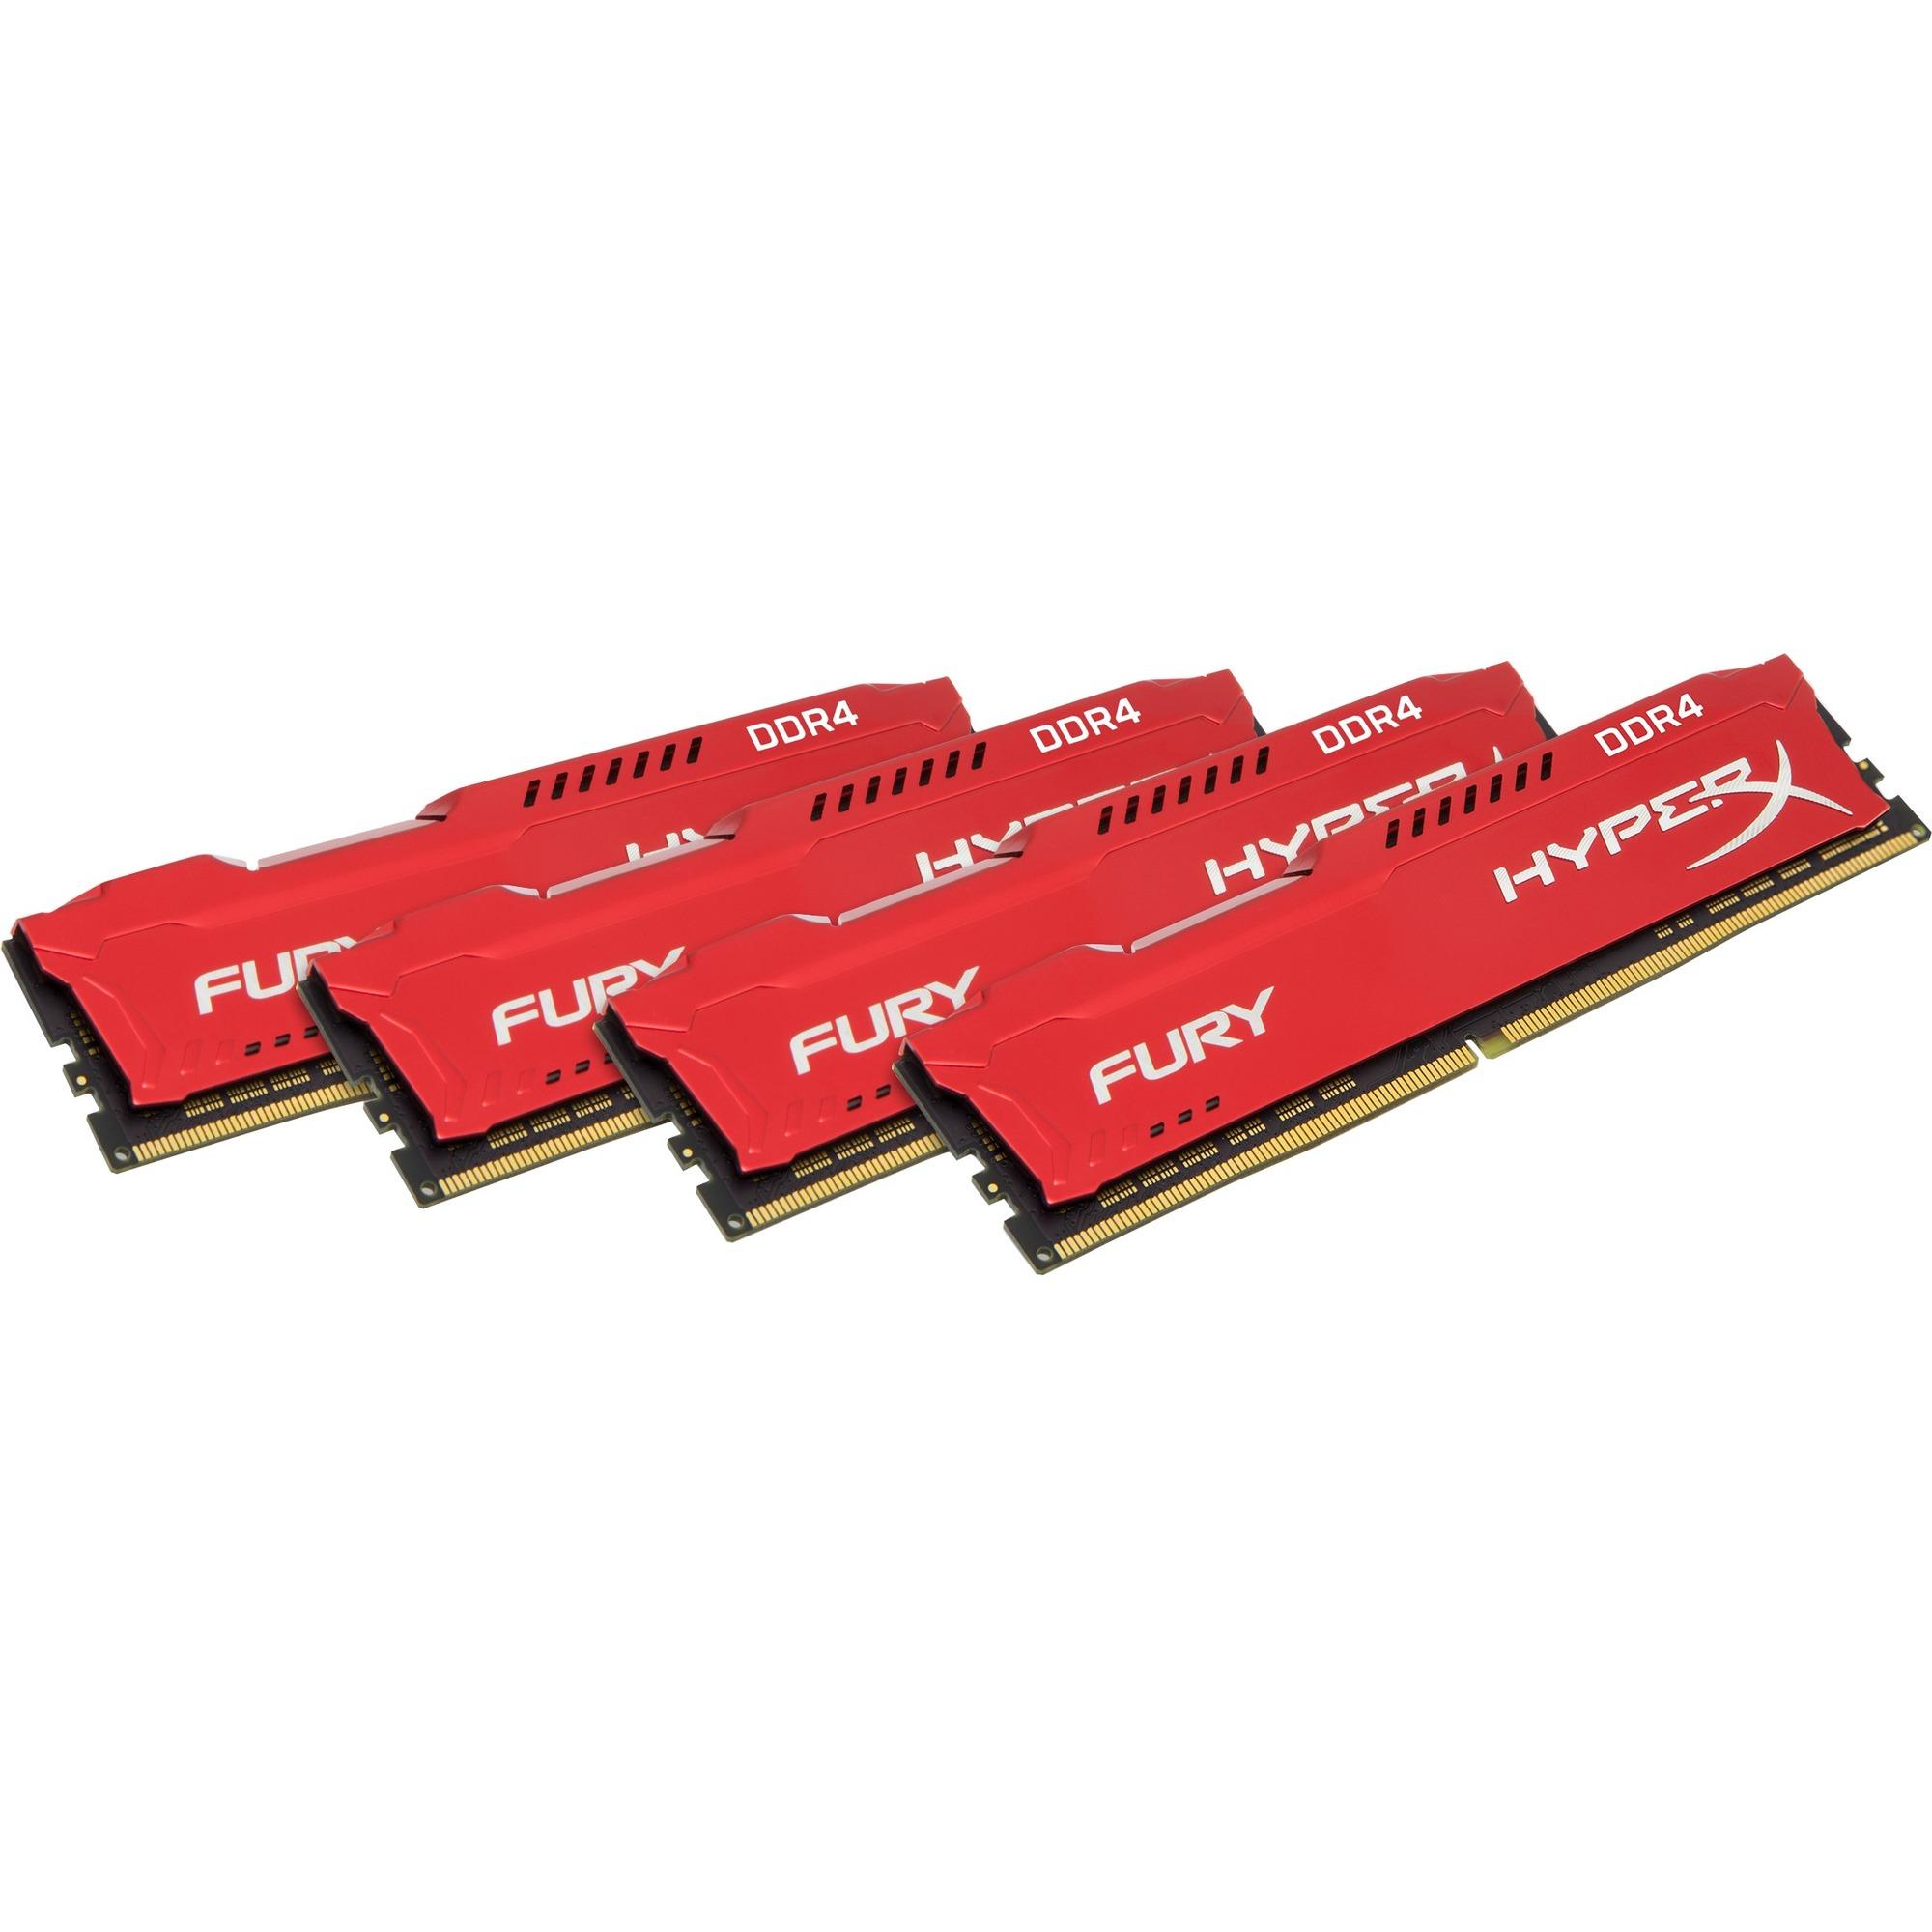 Kingston HyperX Fury RAM Module - 32 GB 4 x 8 GB - DDR4 SDRAM - 2666 MHz DDR4-2666/PC4-21300 - 1.20 V - Non-ECC - Unbuffered - CL16 - 288-pin - DIMM